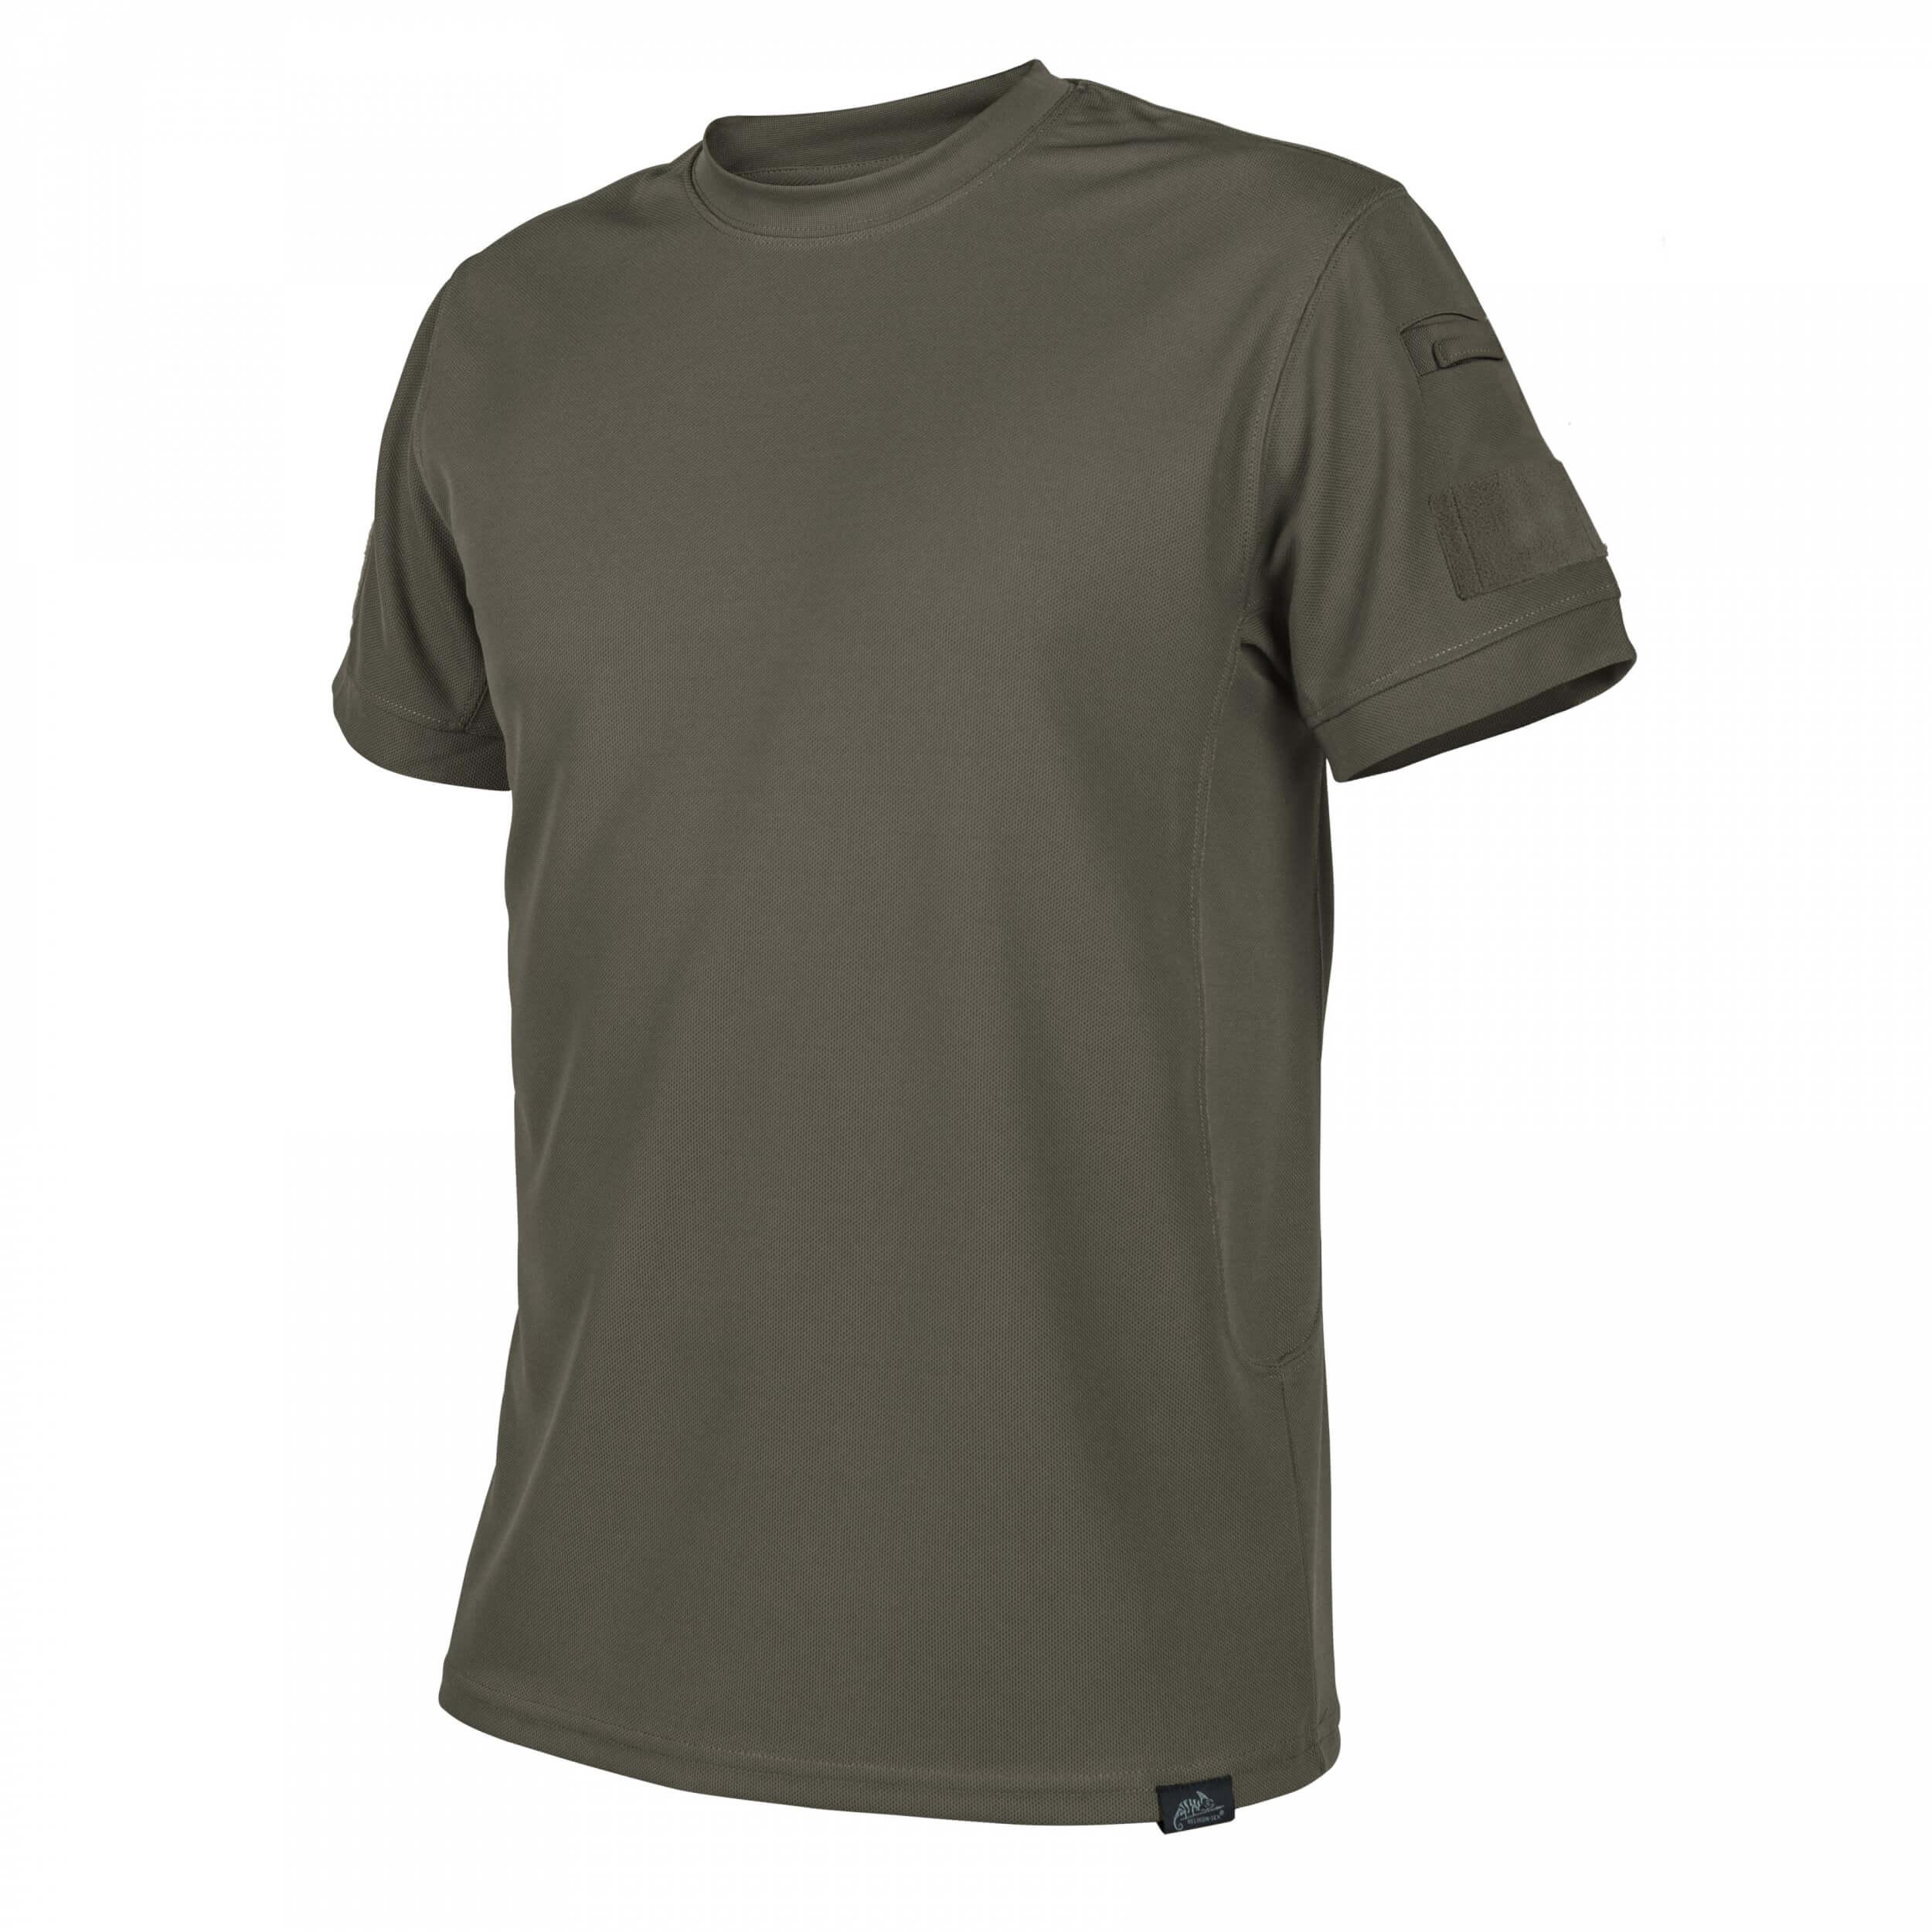 Helikon-Tex TACTICAL T-Shirt - TopCool Lite - Olive Green